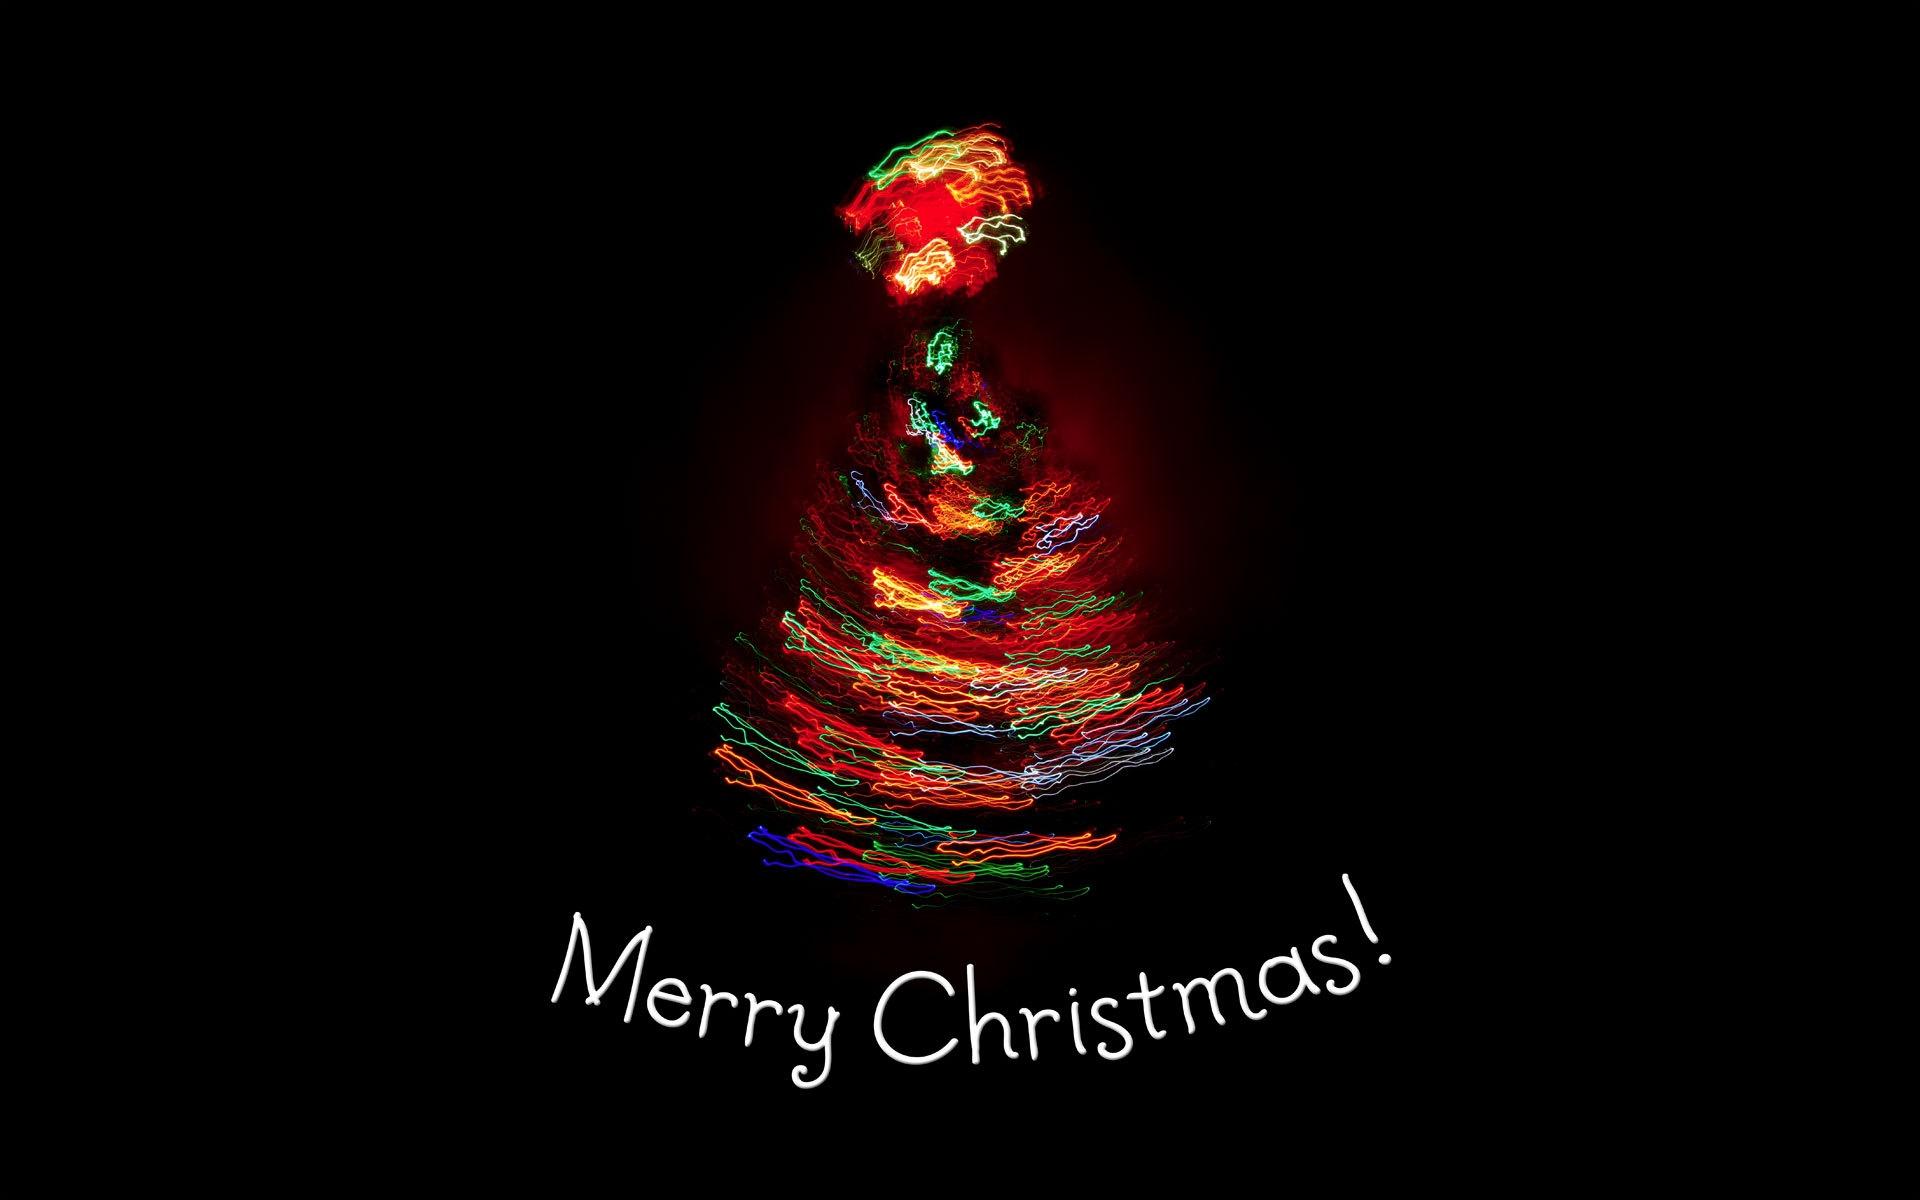 Merry Christmas Tree 4K Ultra Hd Pc Wallpaper - HD Wallpapers